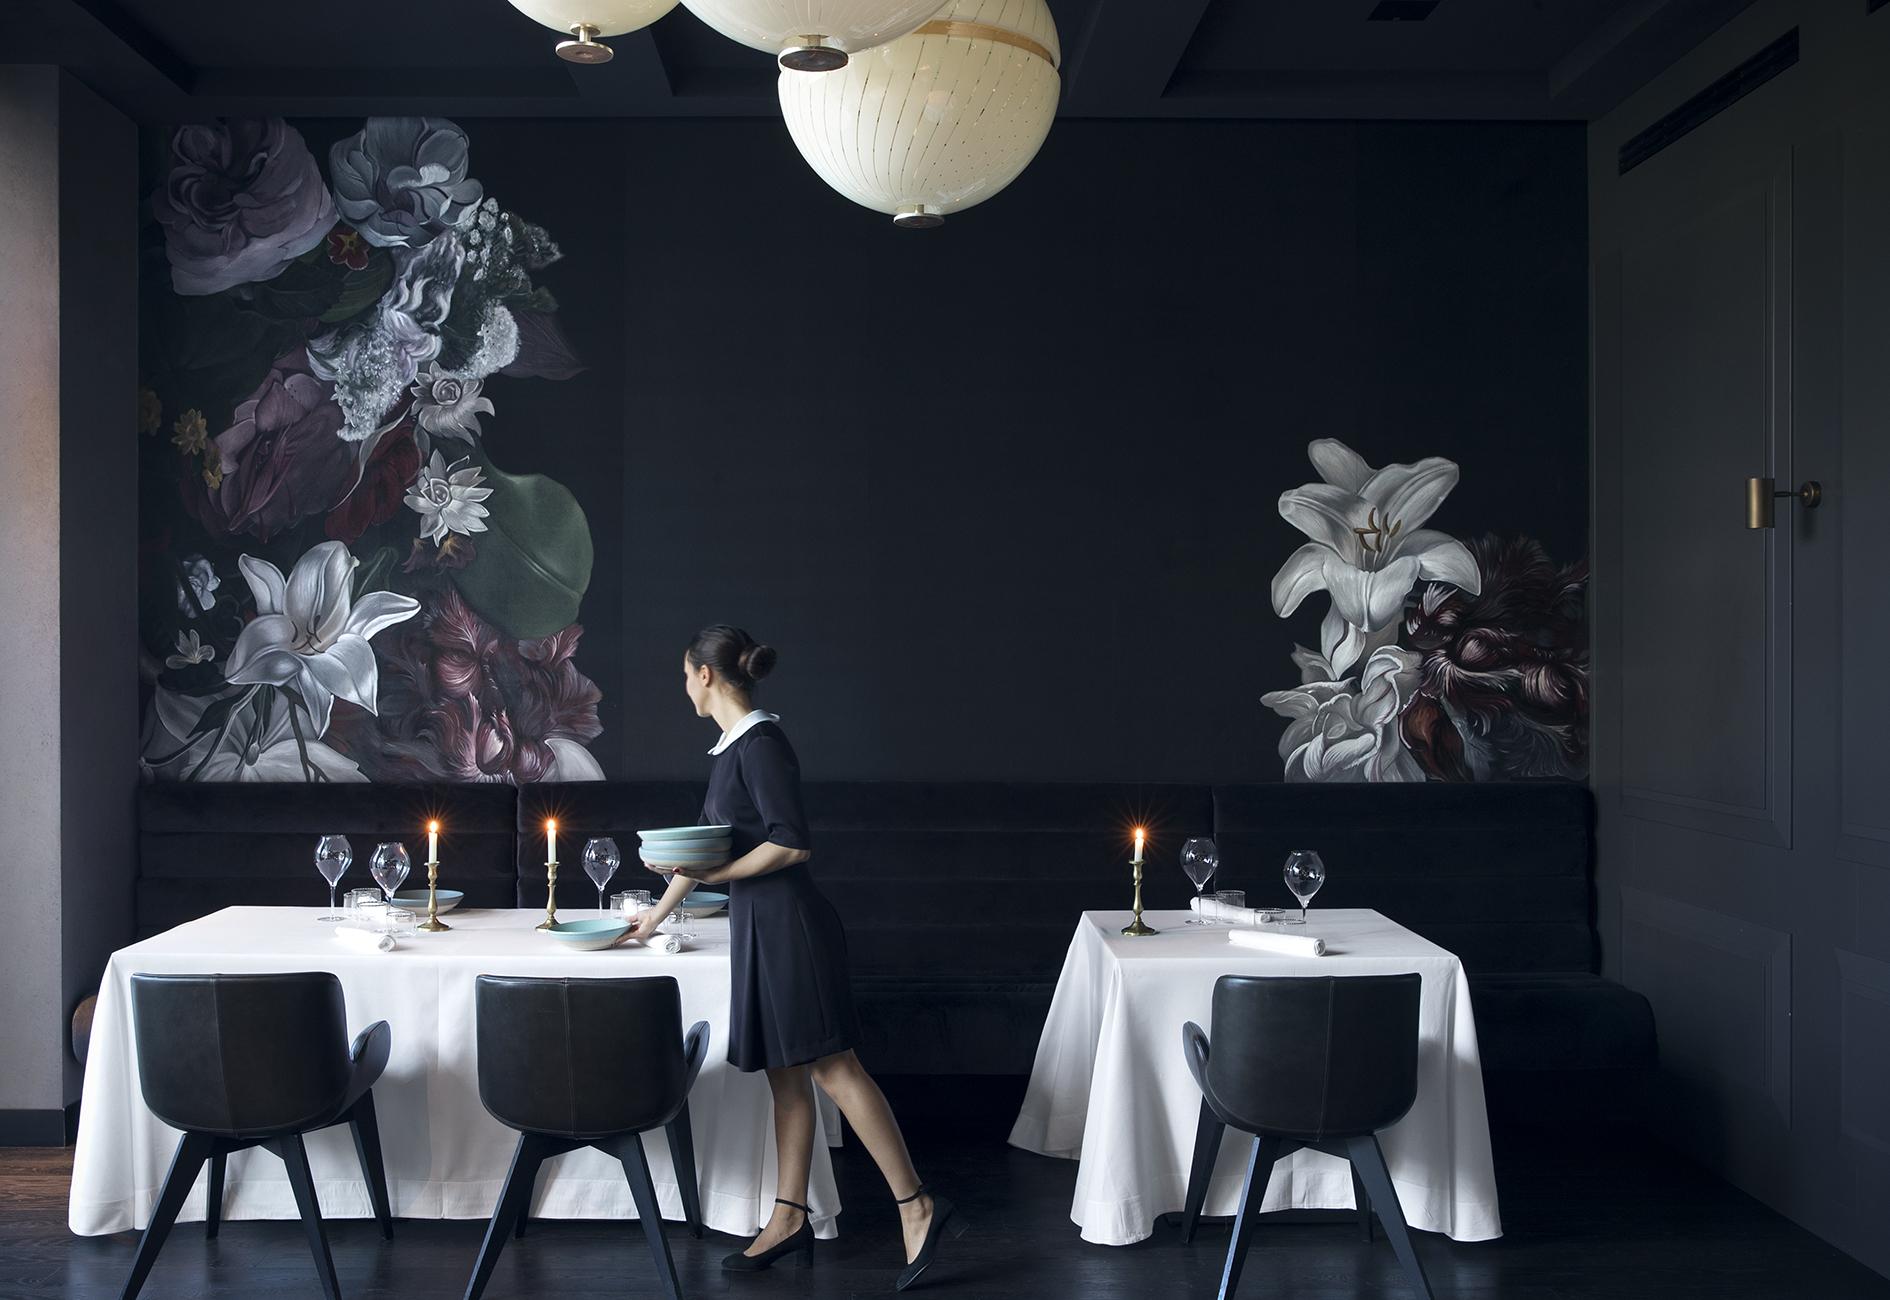 Stefania Giorgi Food Portraits Lifestyle and Interiors photographer   HOTEL DETAILS